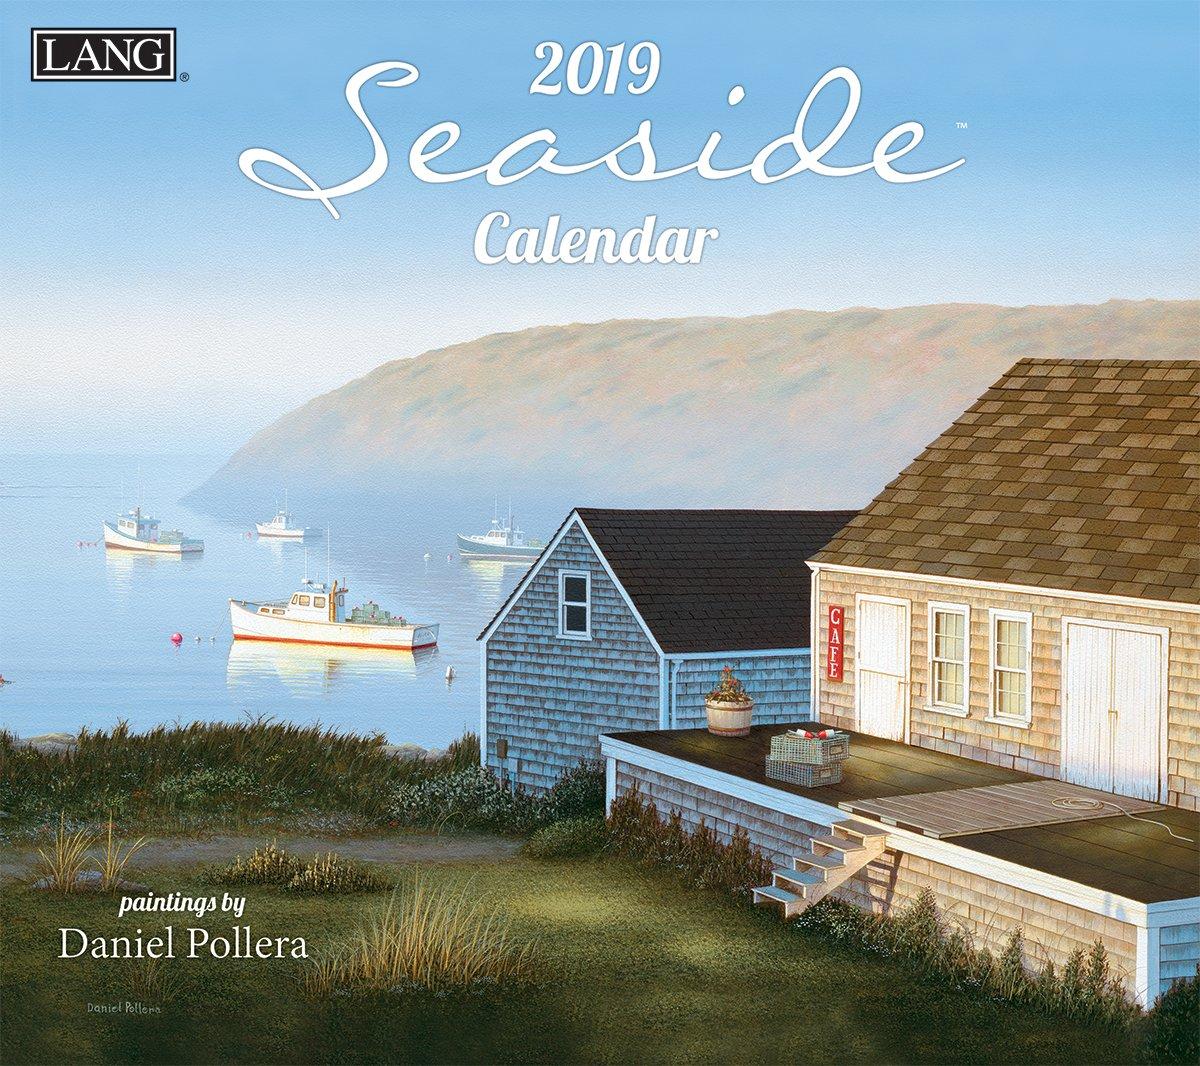 The Lang Companies Seaside 2019 Wall Calendar (19991001877)